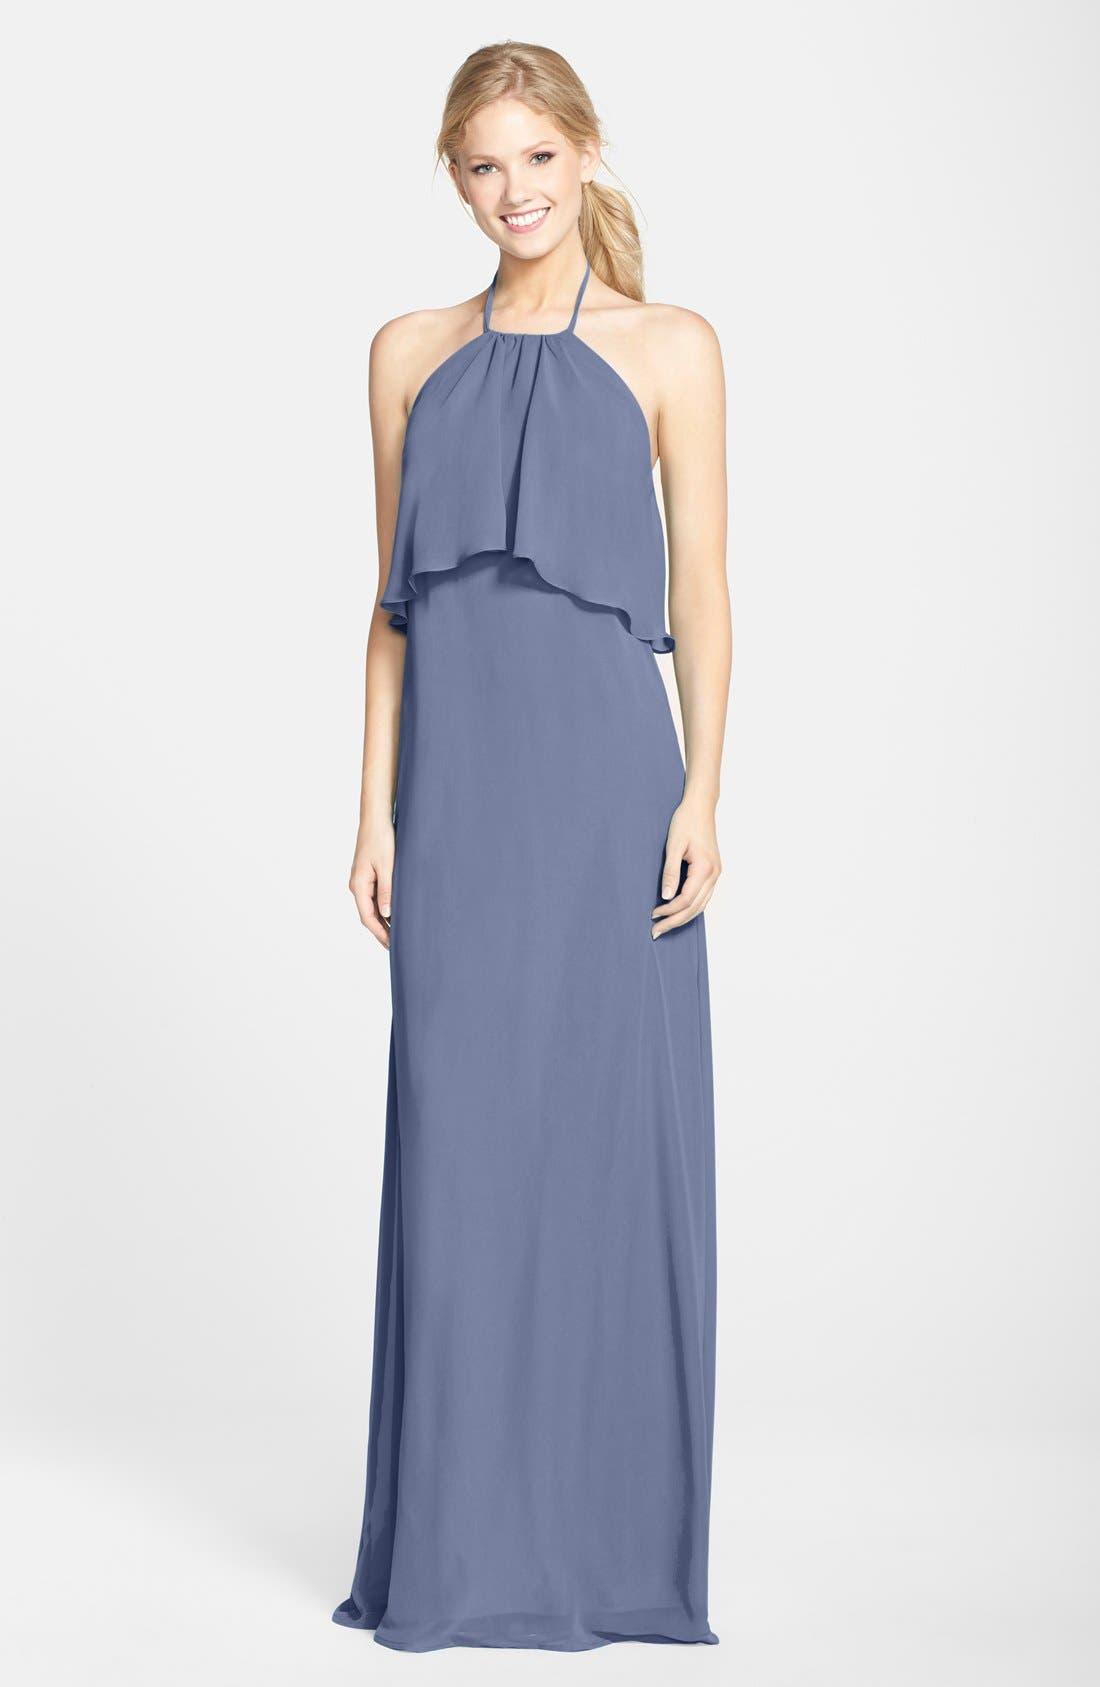 Alternate Image 1 Selected - nouvelle AMSALE 'Cait' Chiffon Halter Gown